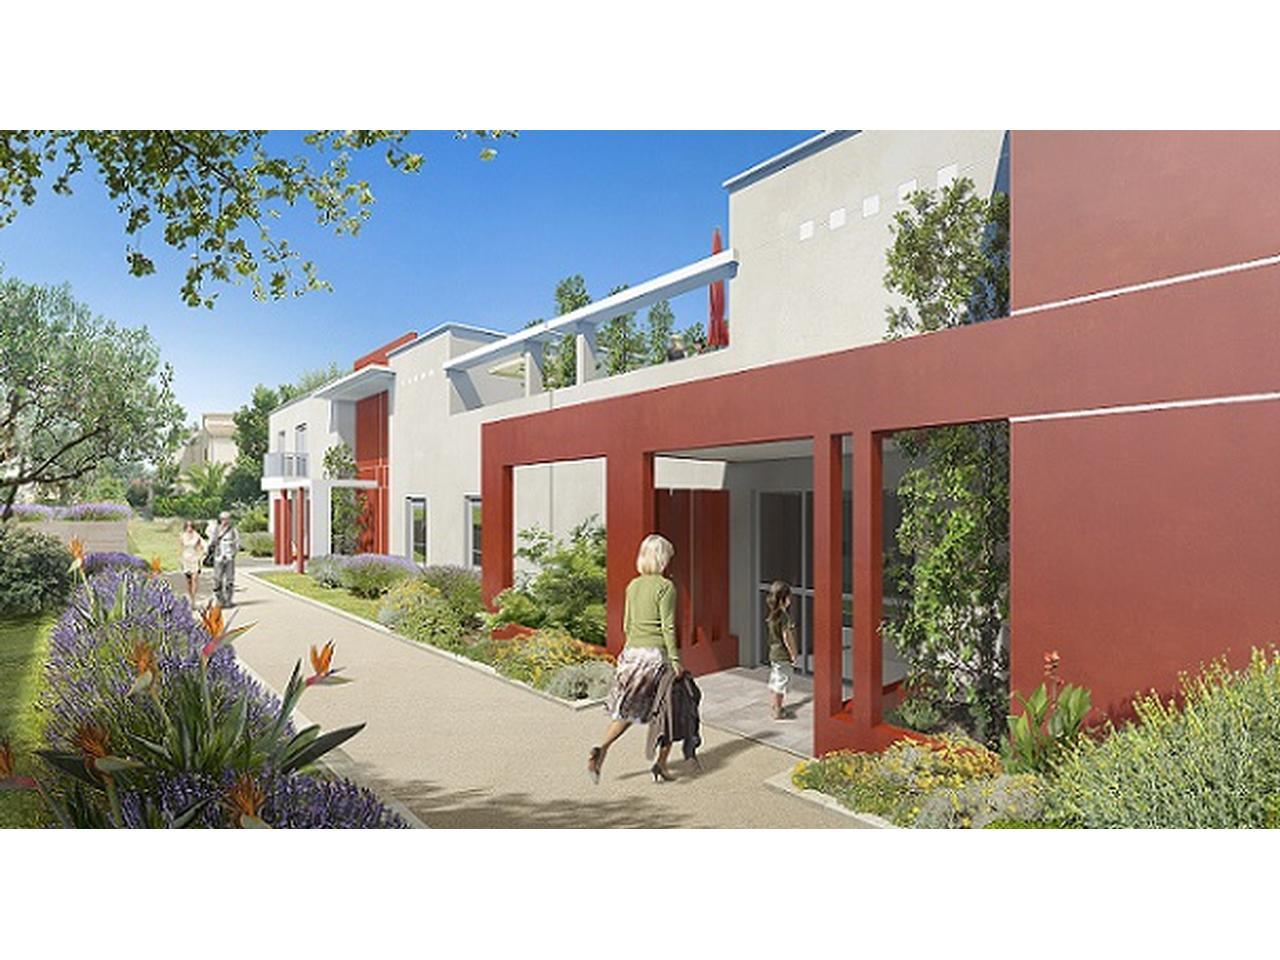 Immobilier nice vue mer appartement nice 3 pieces a vendre - Livraison nice ouest ...